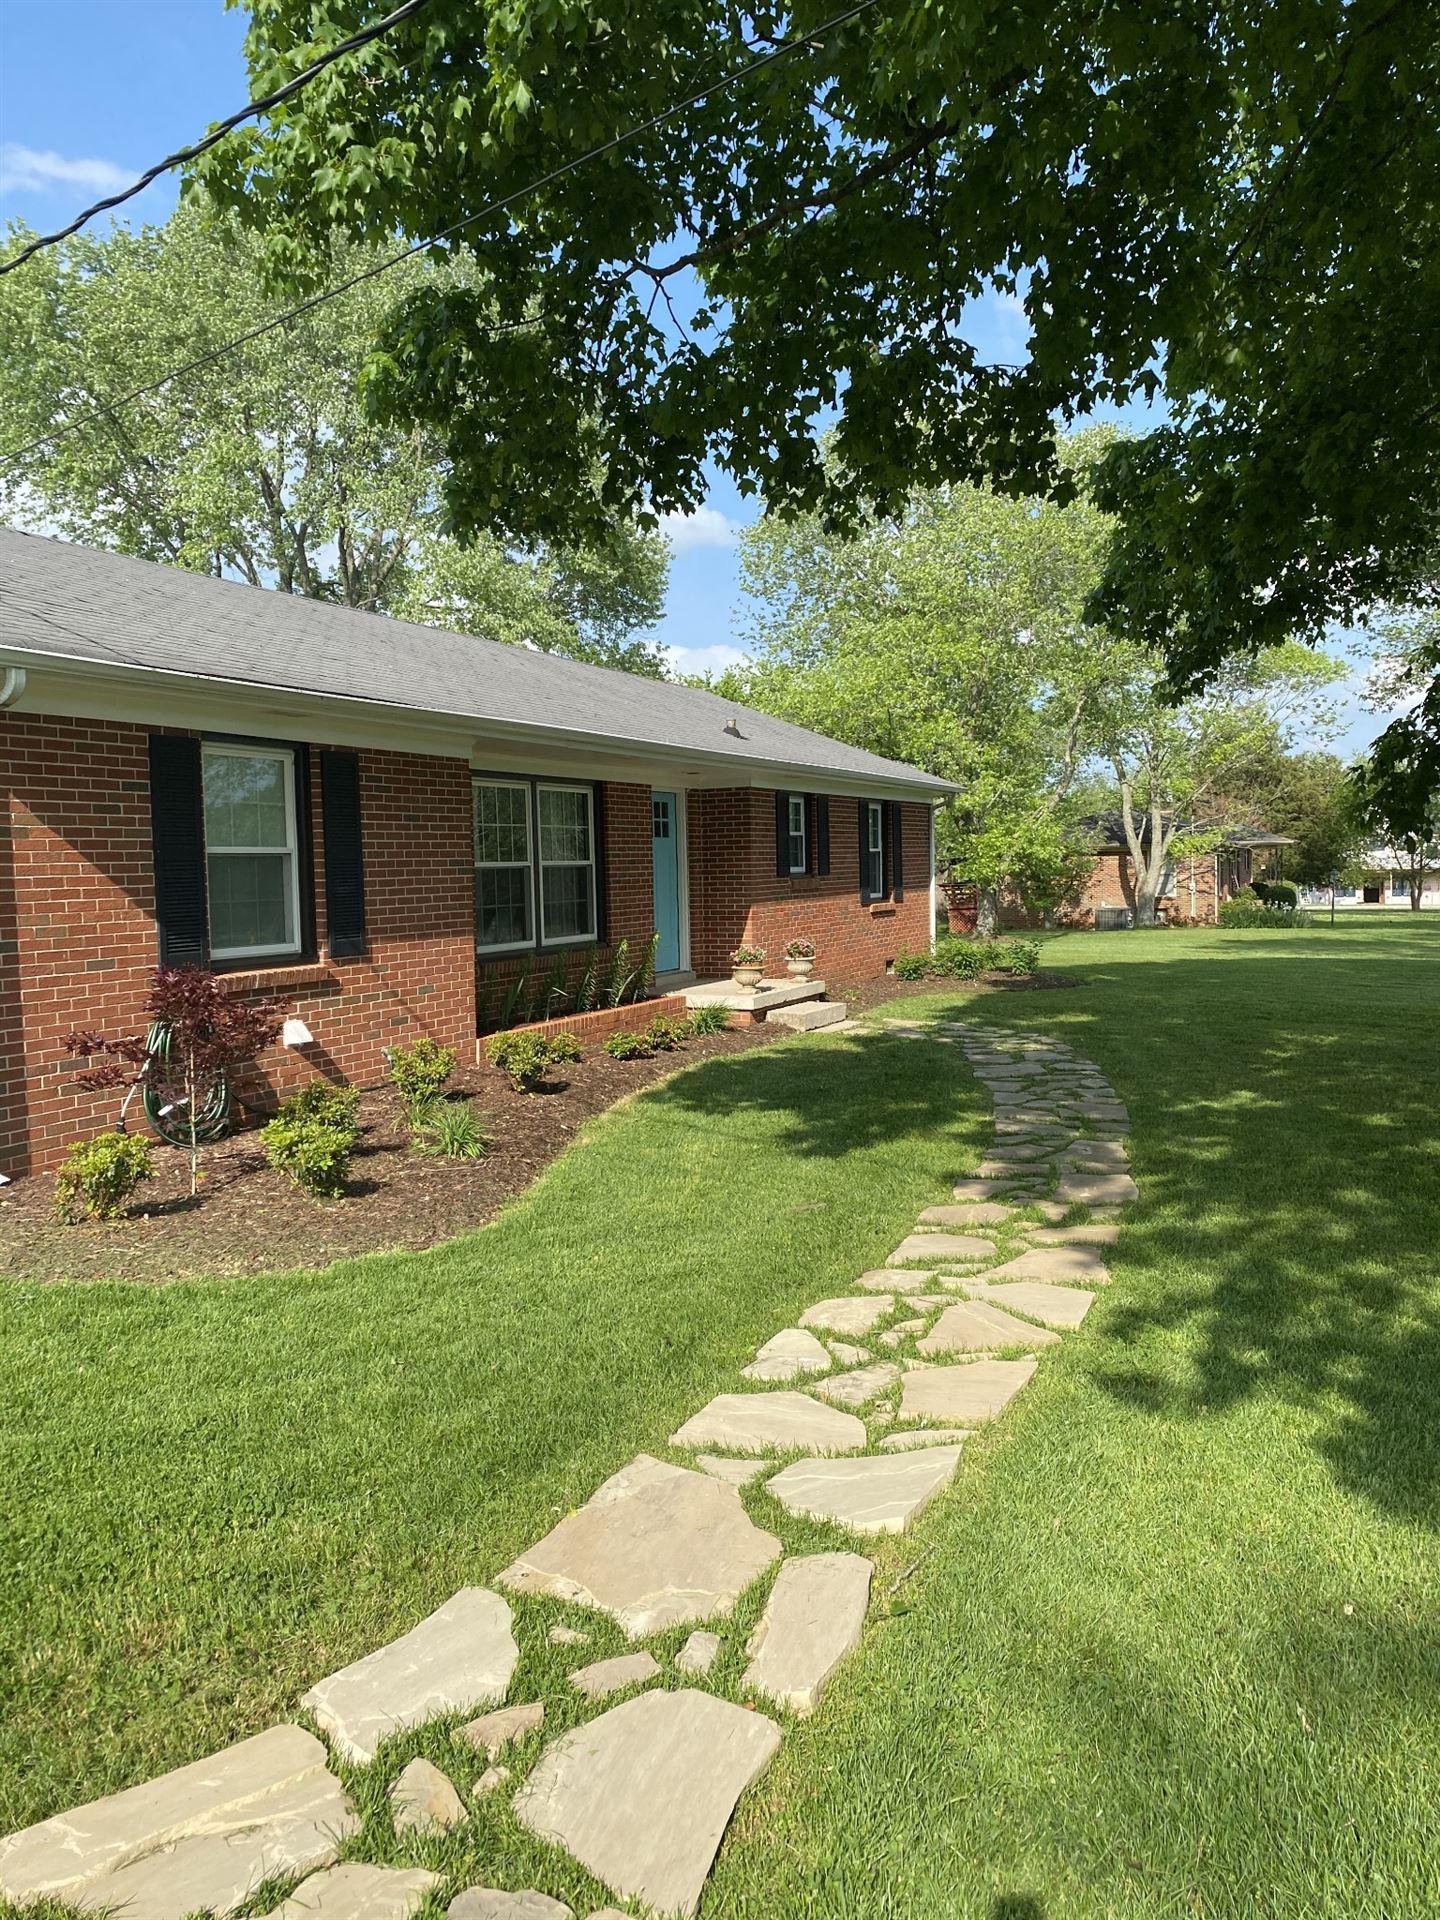 Photo of 4220 Pate Rd, Franklin, TN 37064 (MLS # 2250365)